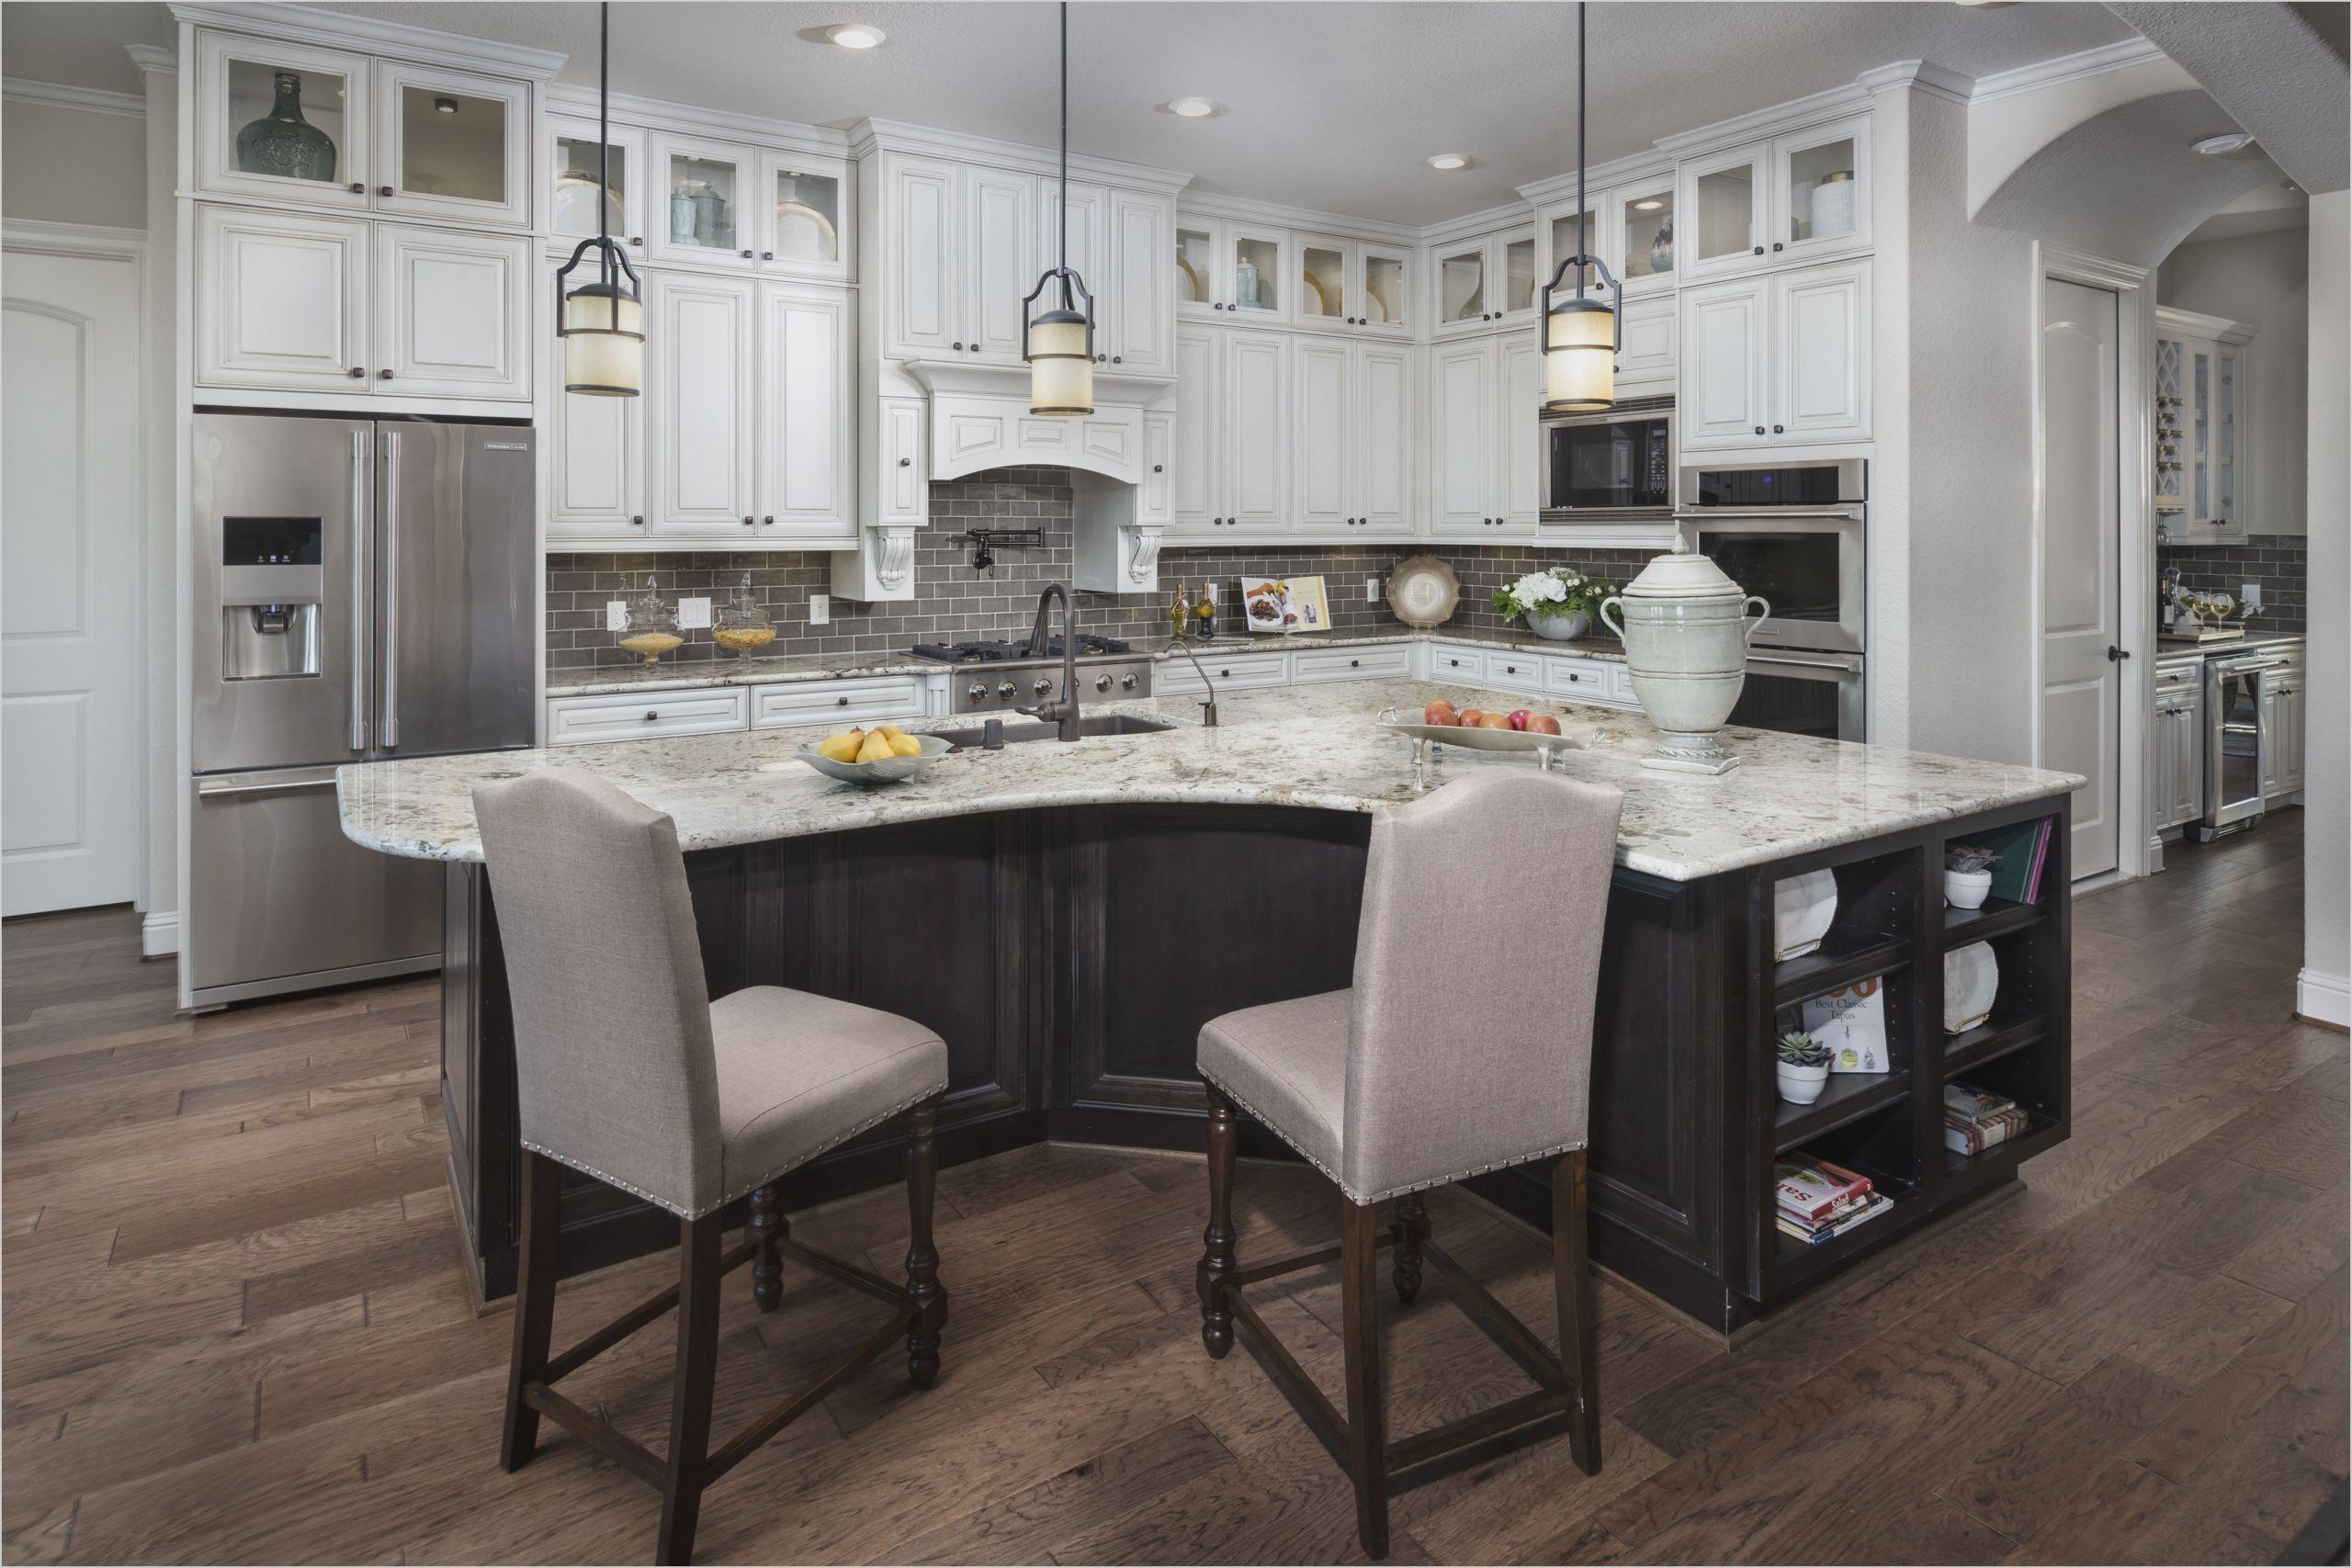 Kitchen Living Room Ideas Hialeah In 2020 Kitchen Design Gallery Kitchen Cabinet Layout Small Kitchen Design Layout